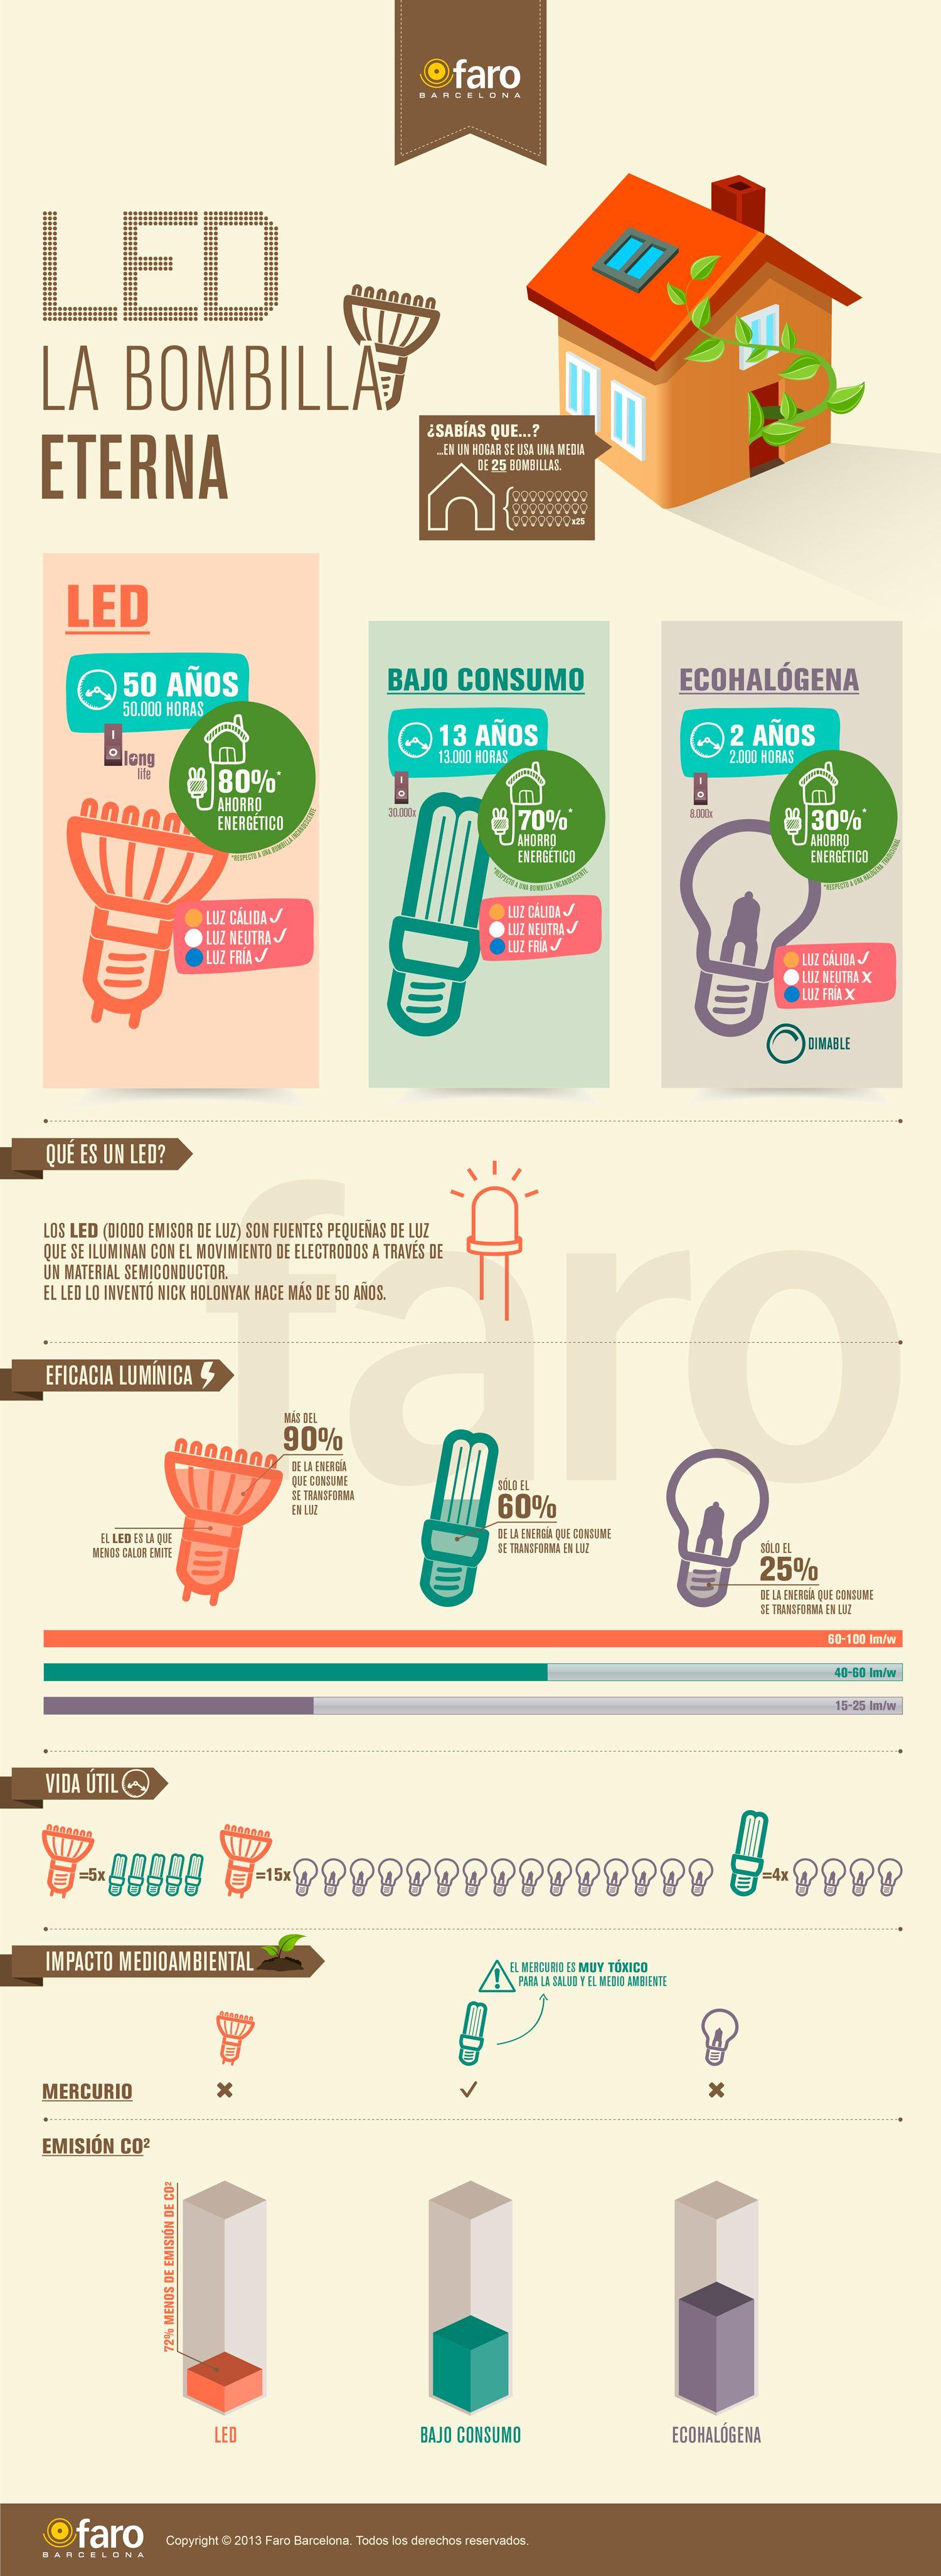 Infografia Led La Bombilla Eterna Bombillas Ahorro De Energia Proyectos De Energia Solar